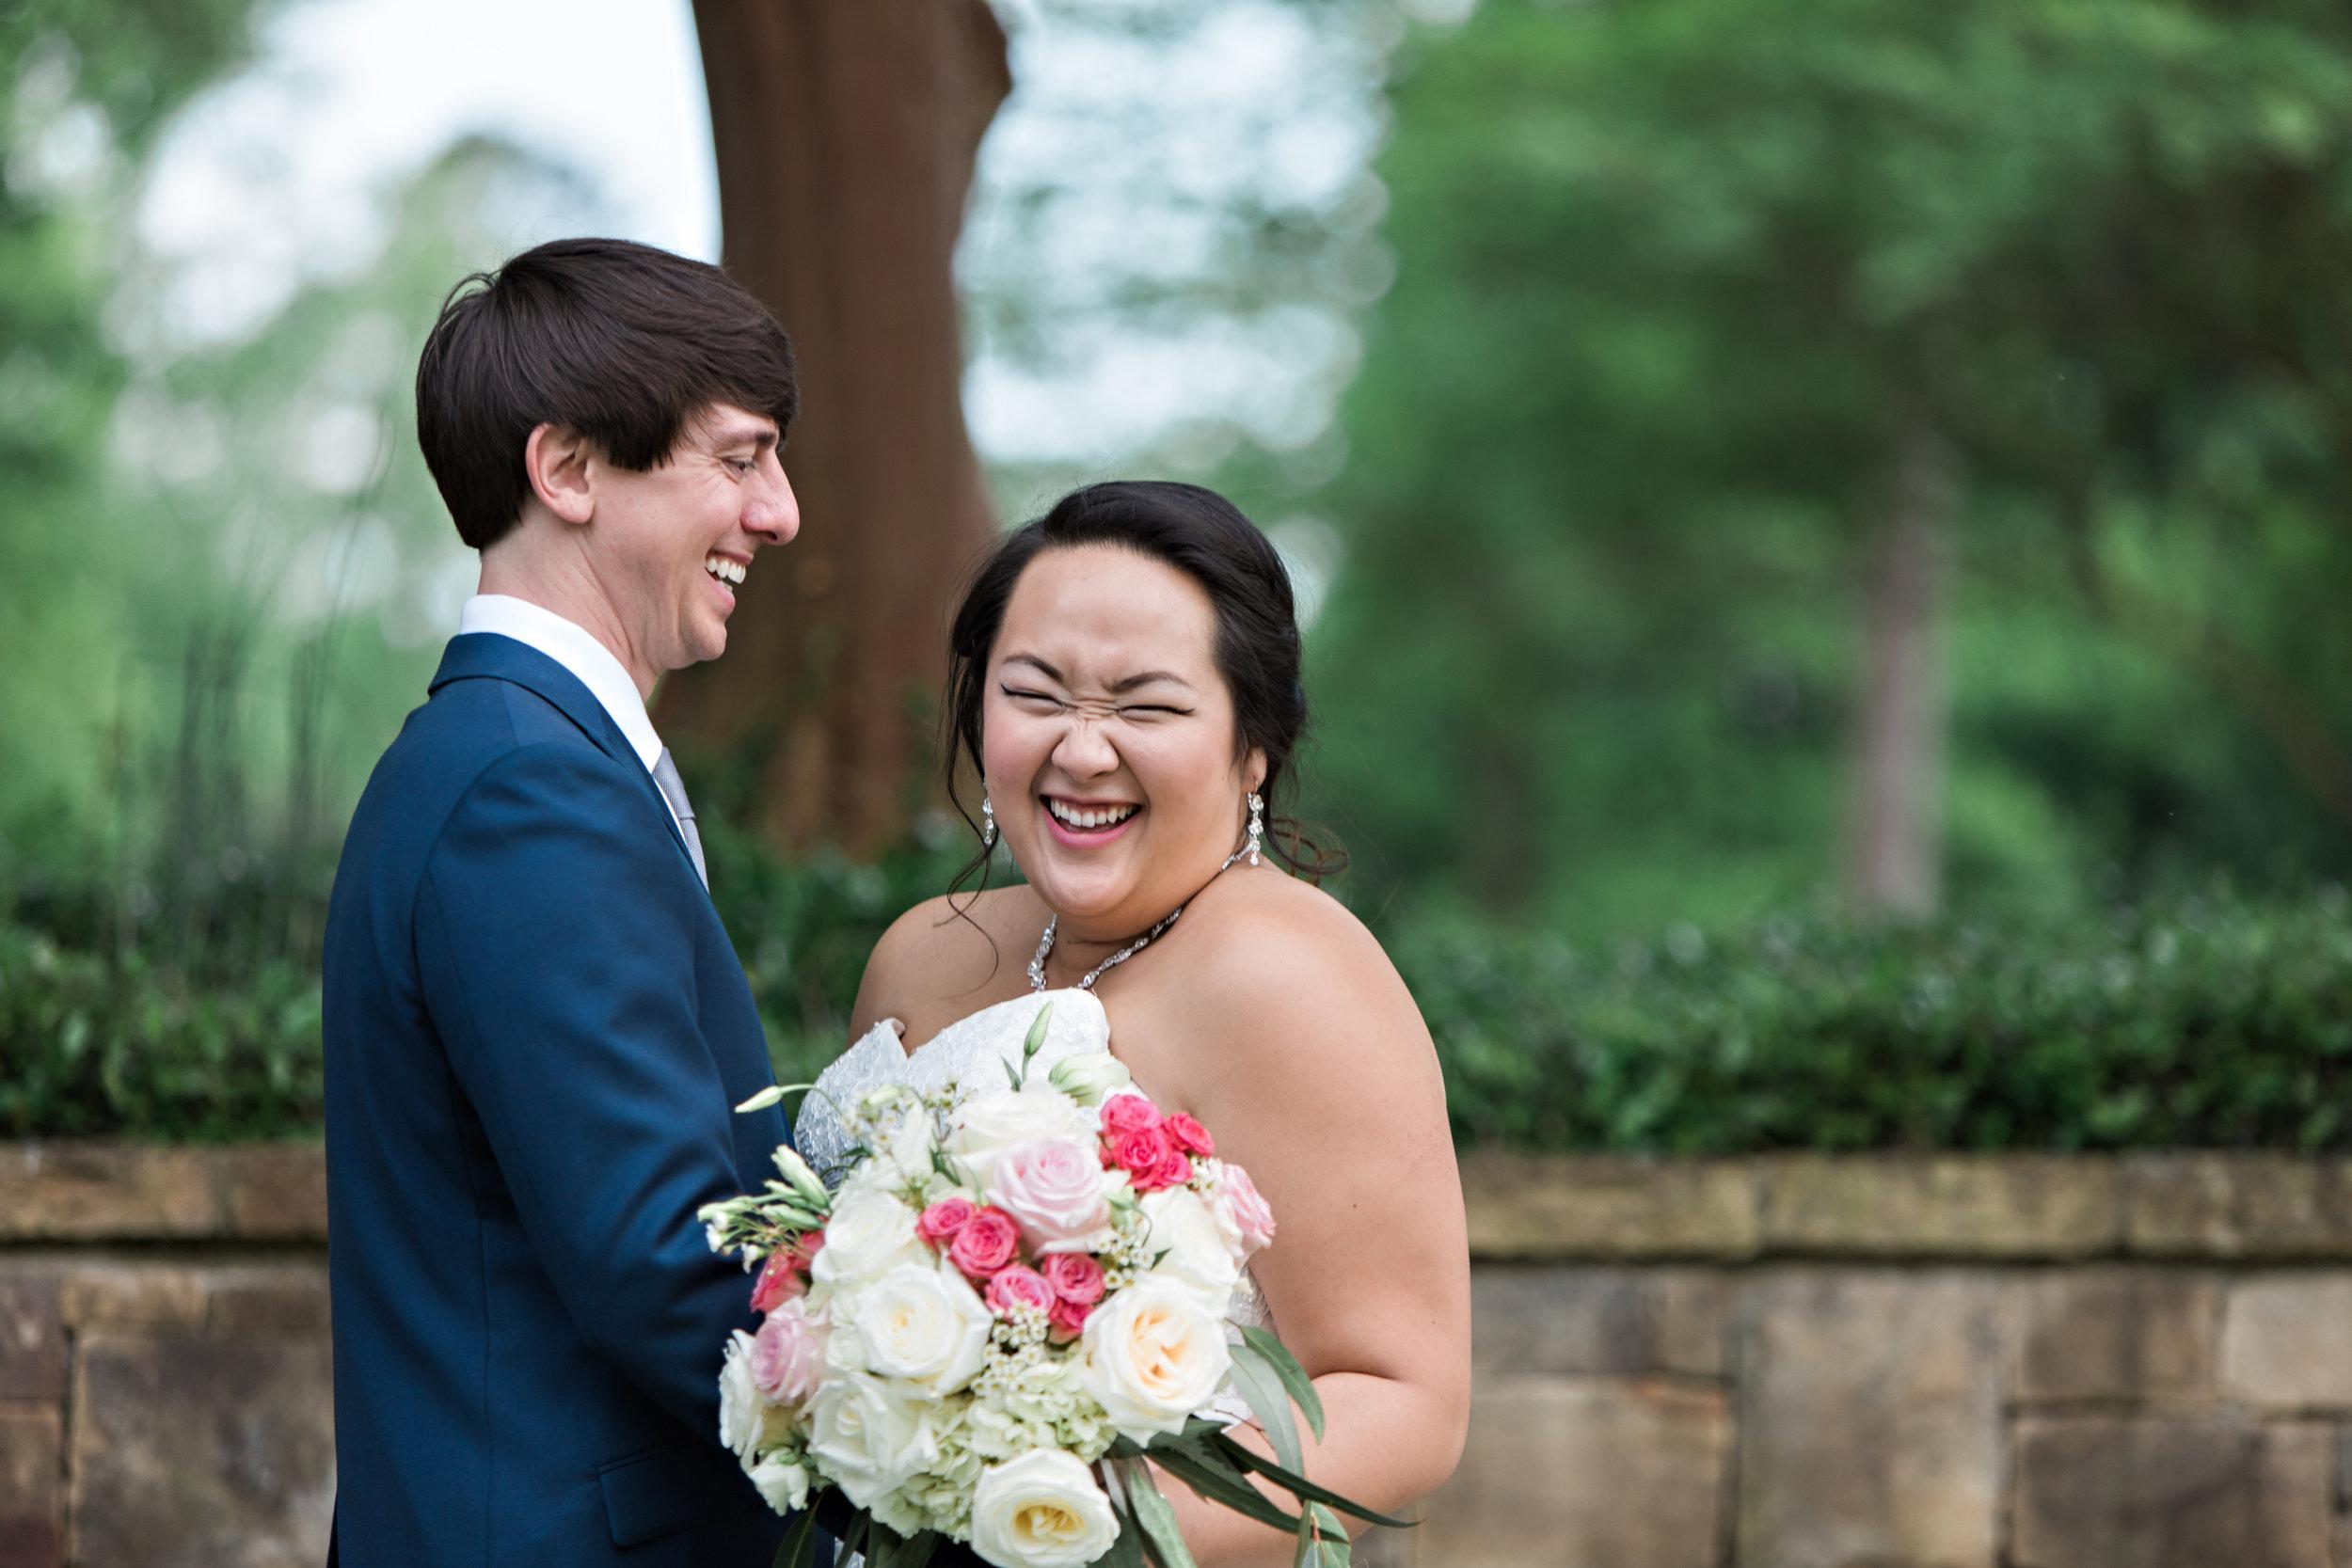 Ni ck-Drollette-Photography-Auburn-Alabama-Weddings-Sylvia-Kevin-153.jpg